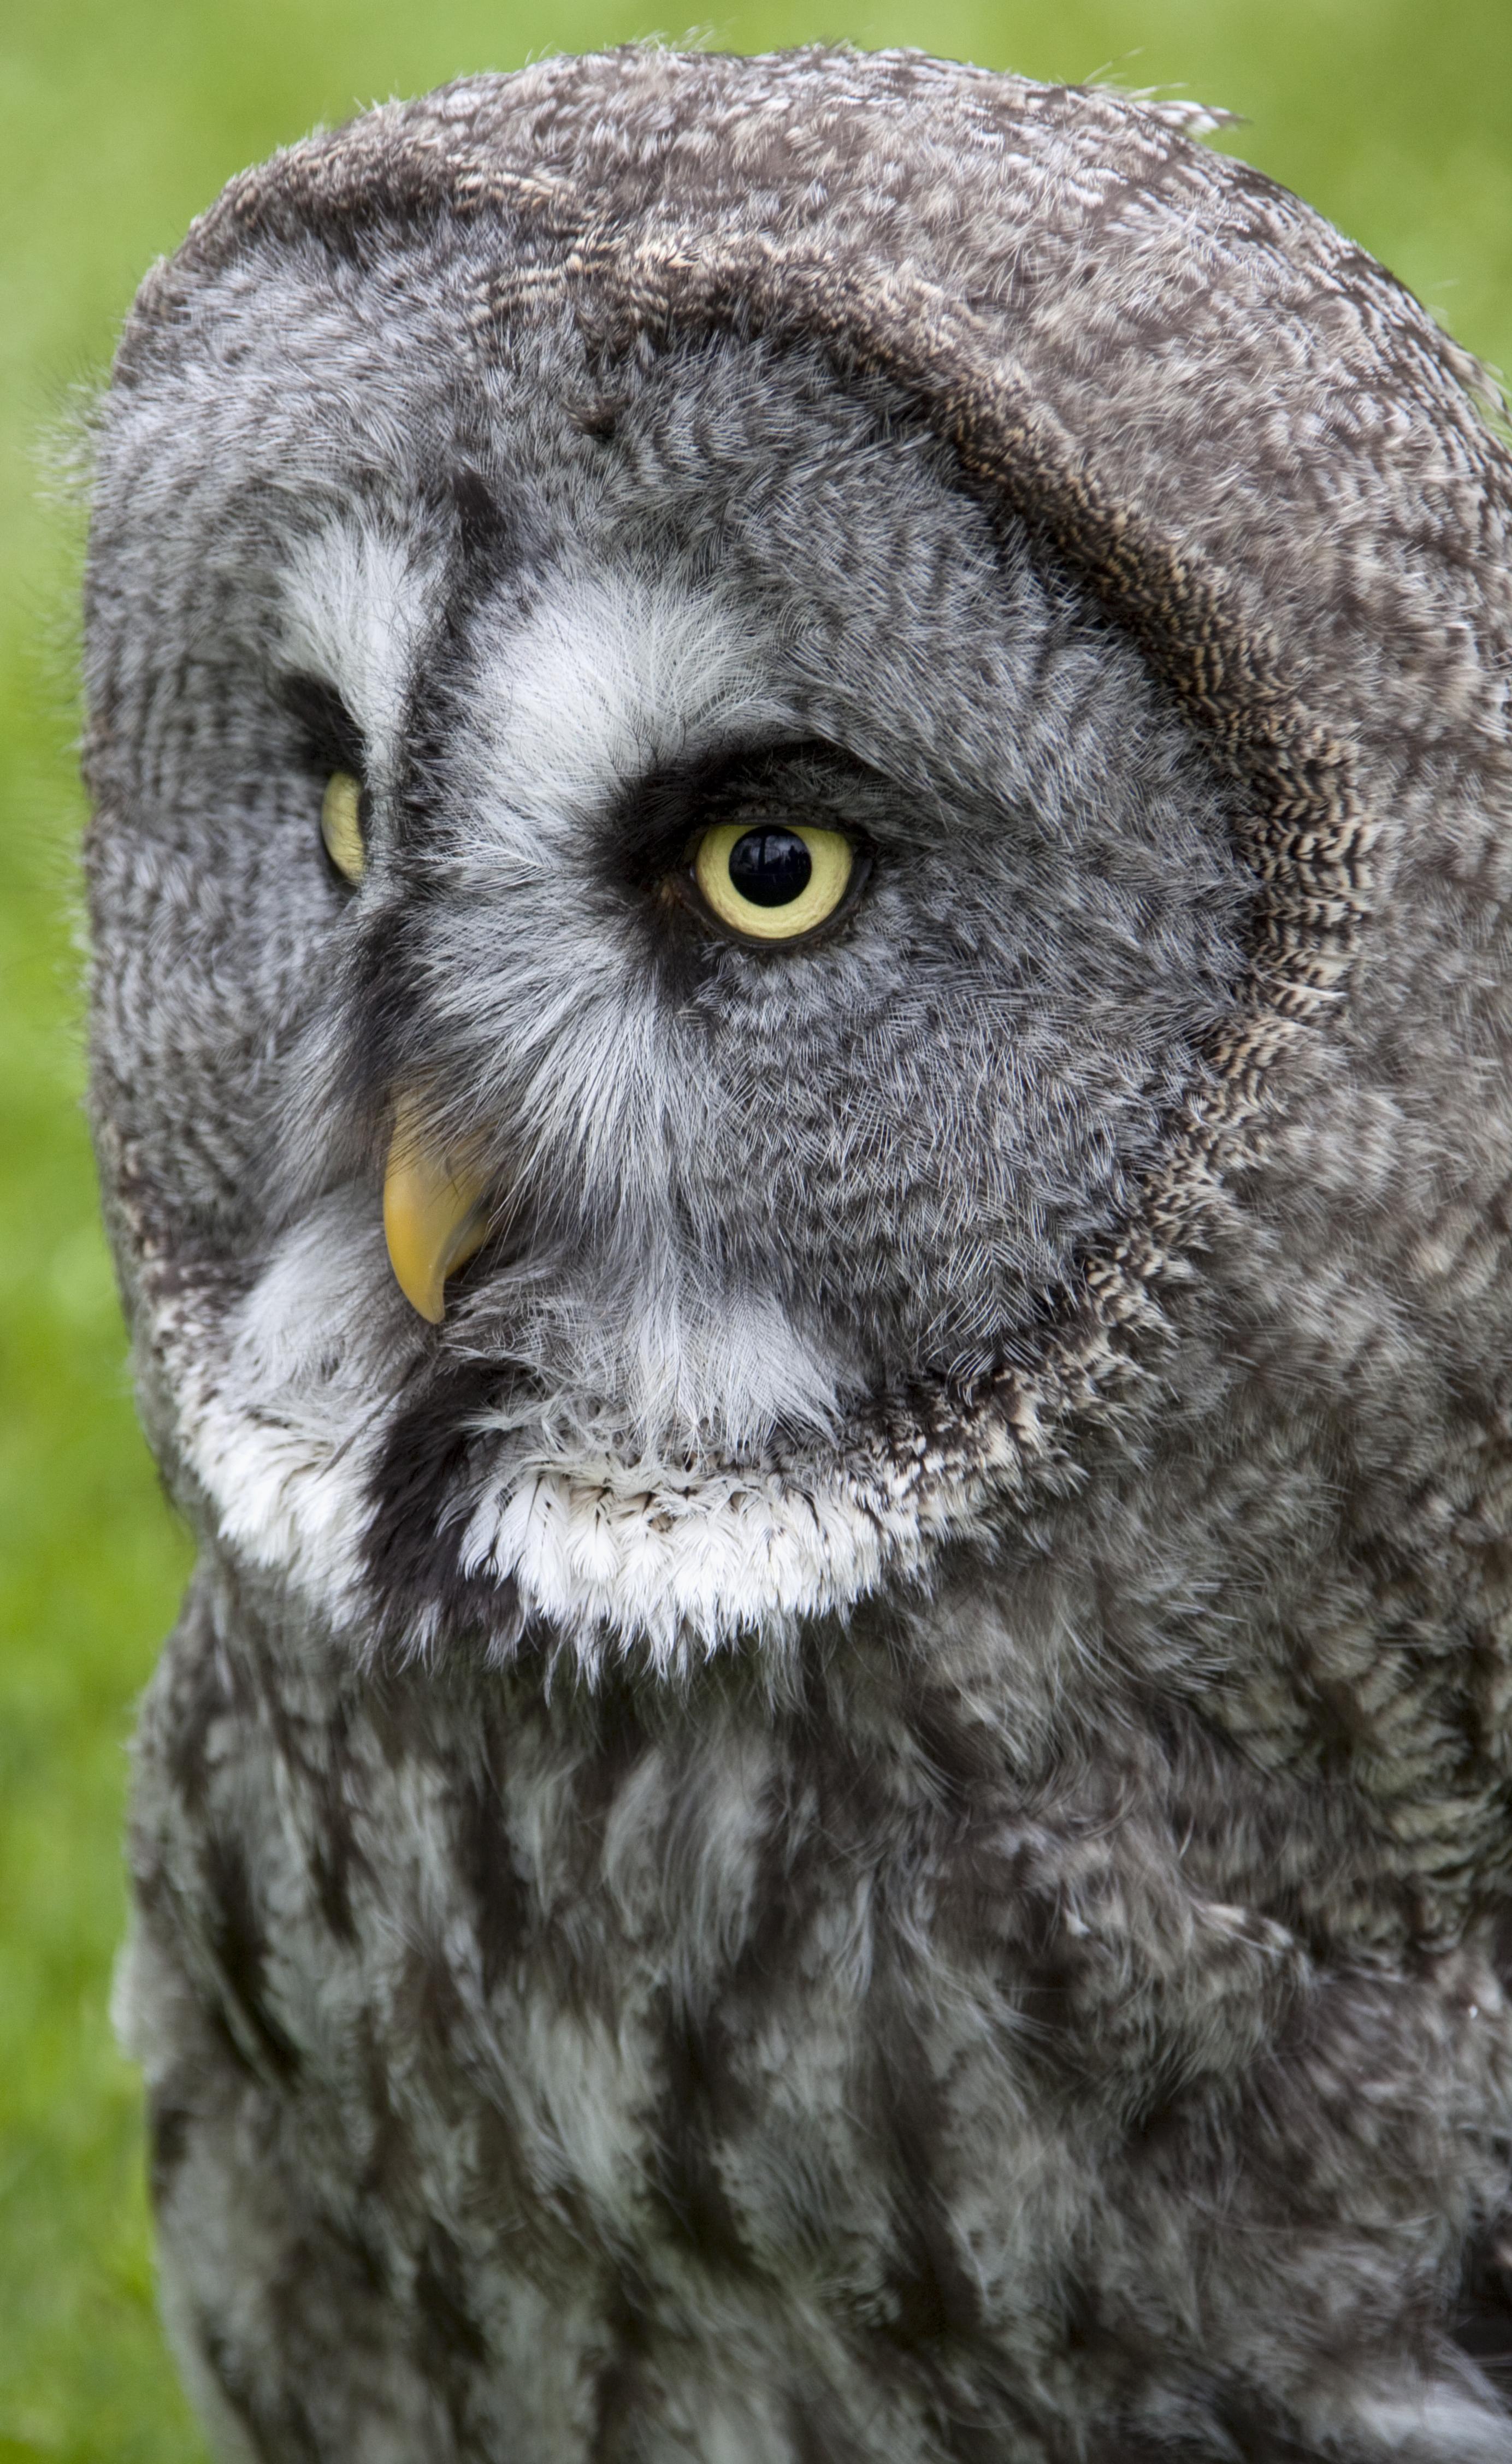 File:Great Grey Owl 1 (4571095634).jpg - Wikimedia Commons